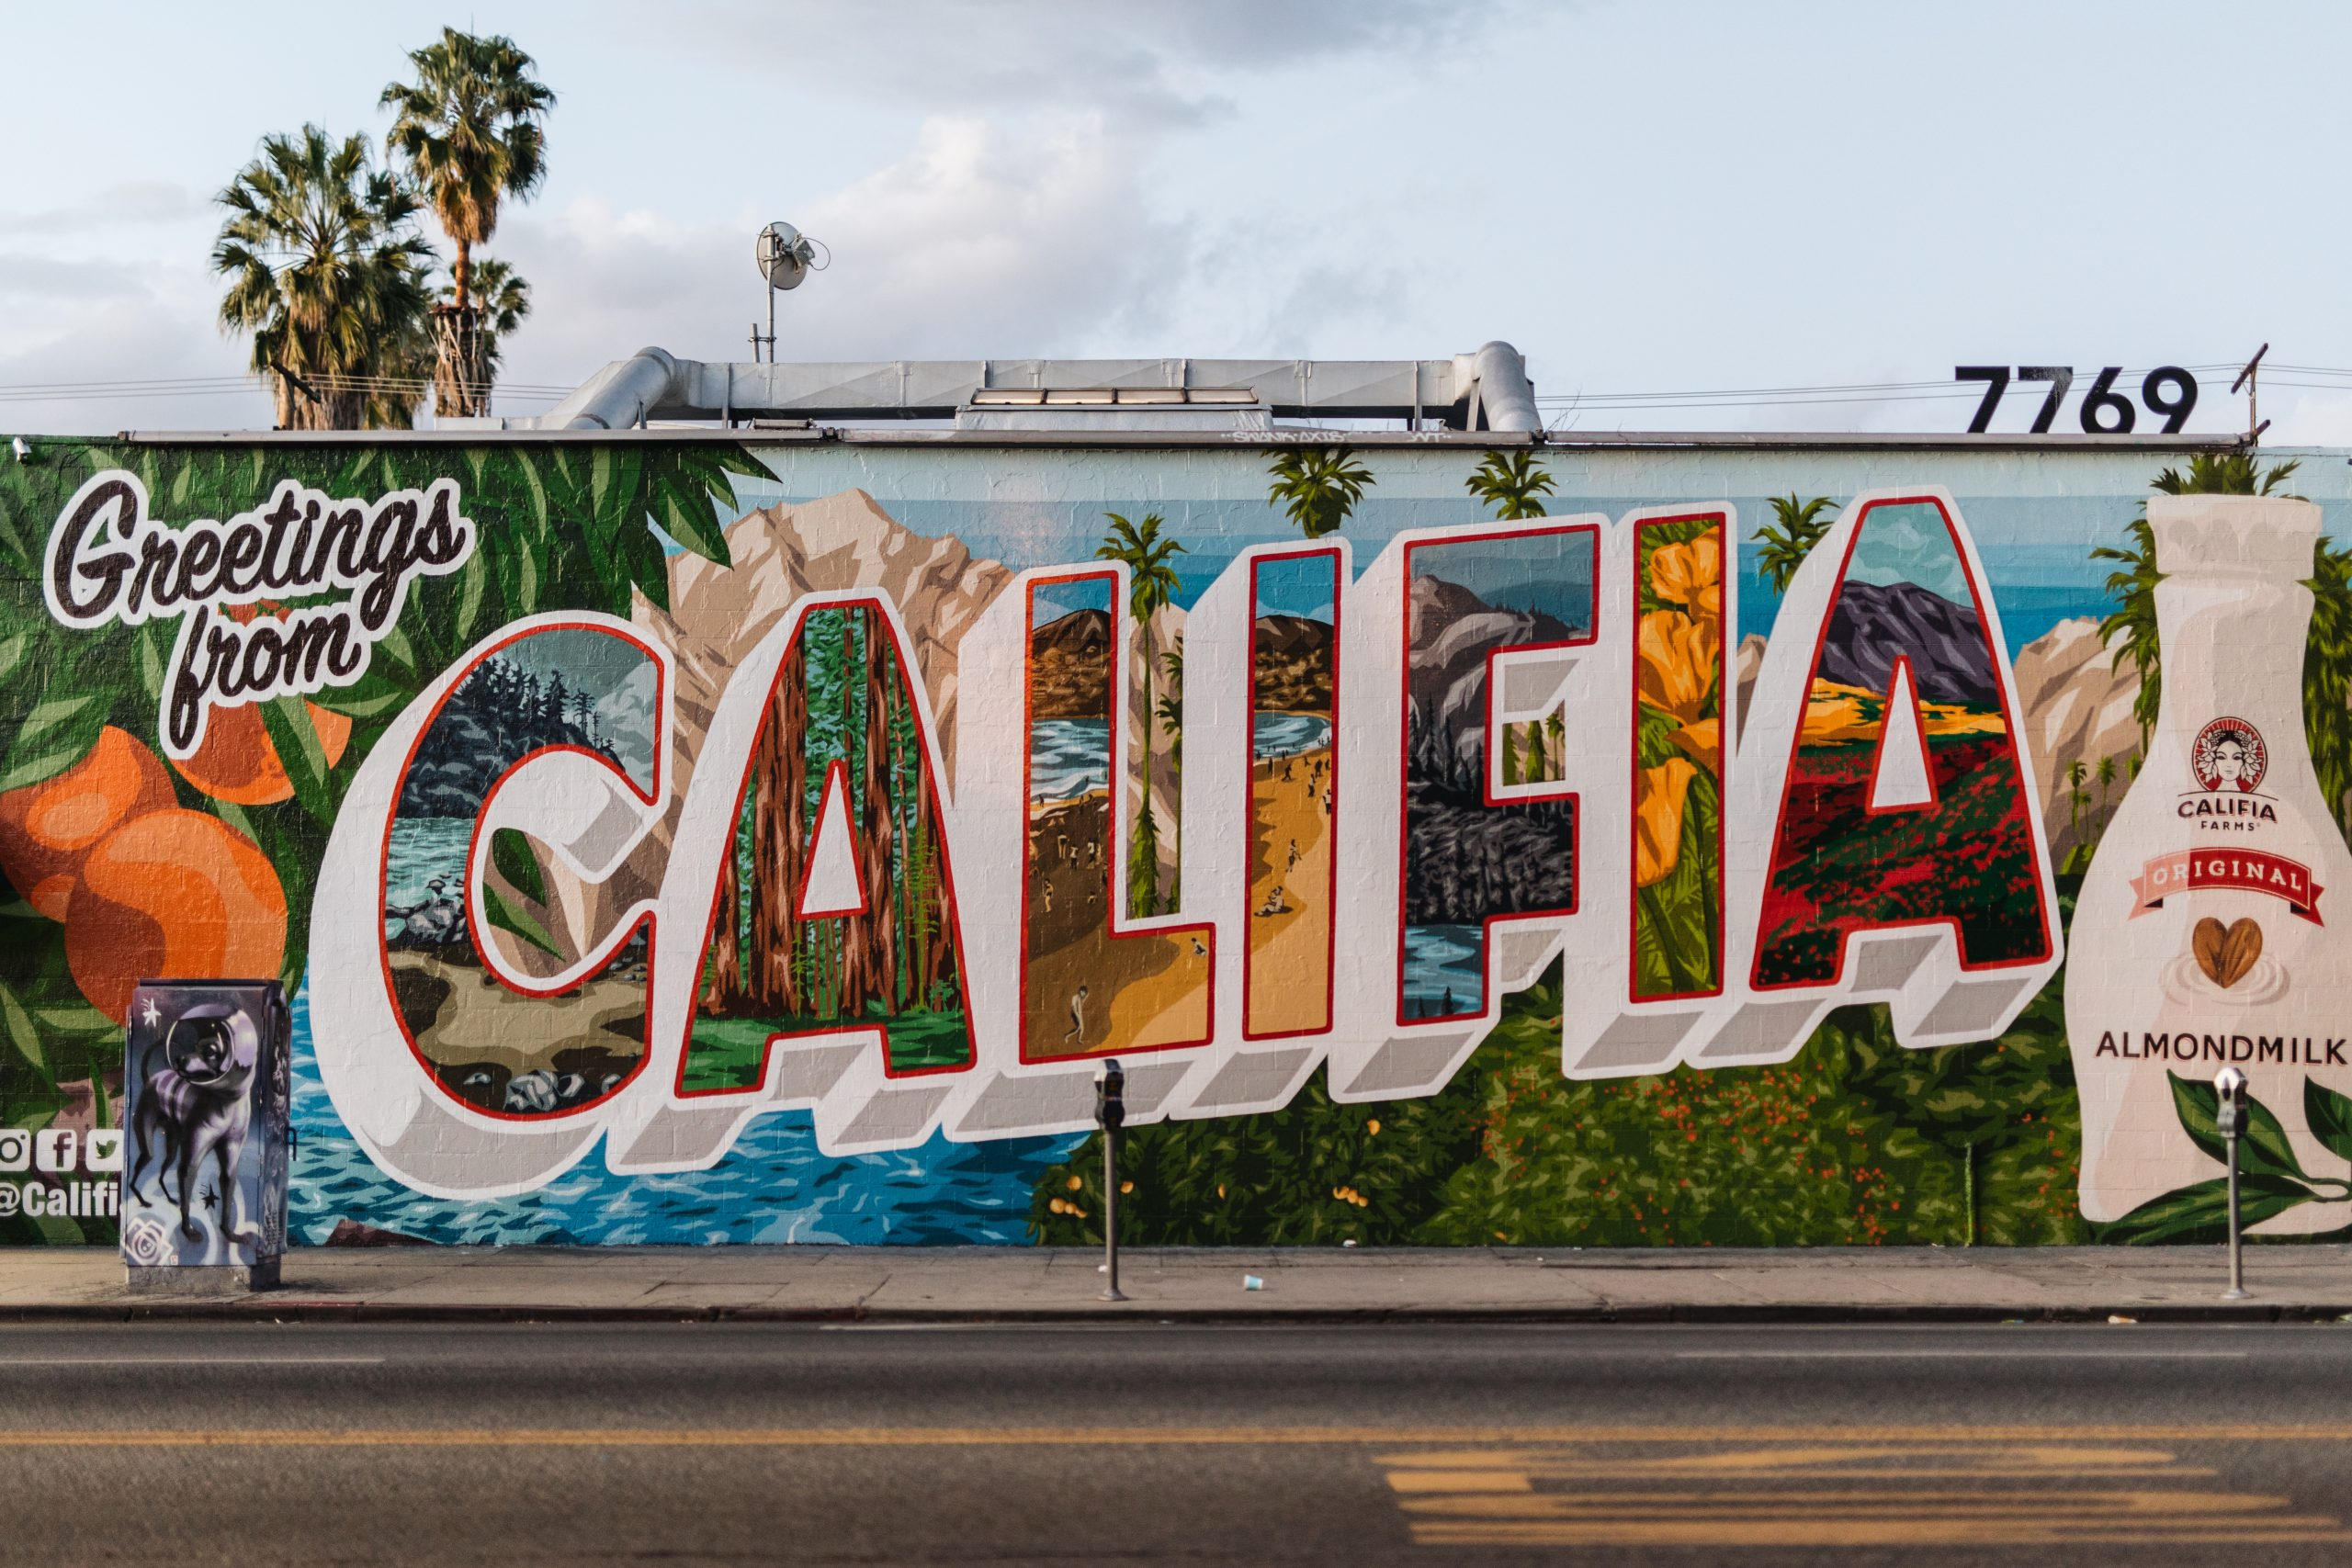 Greetings from Califia graffiti wall